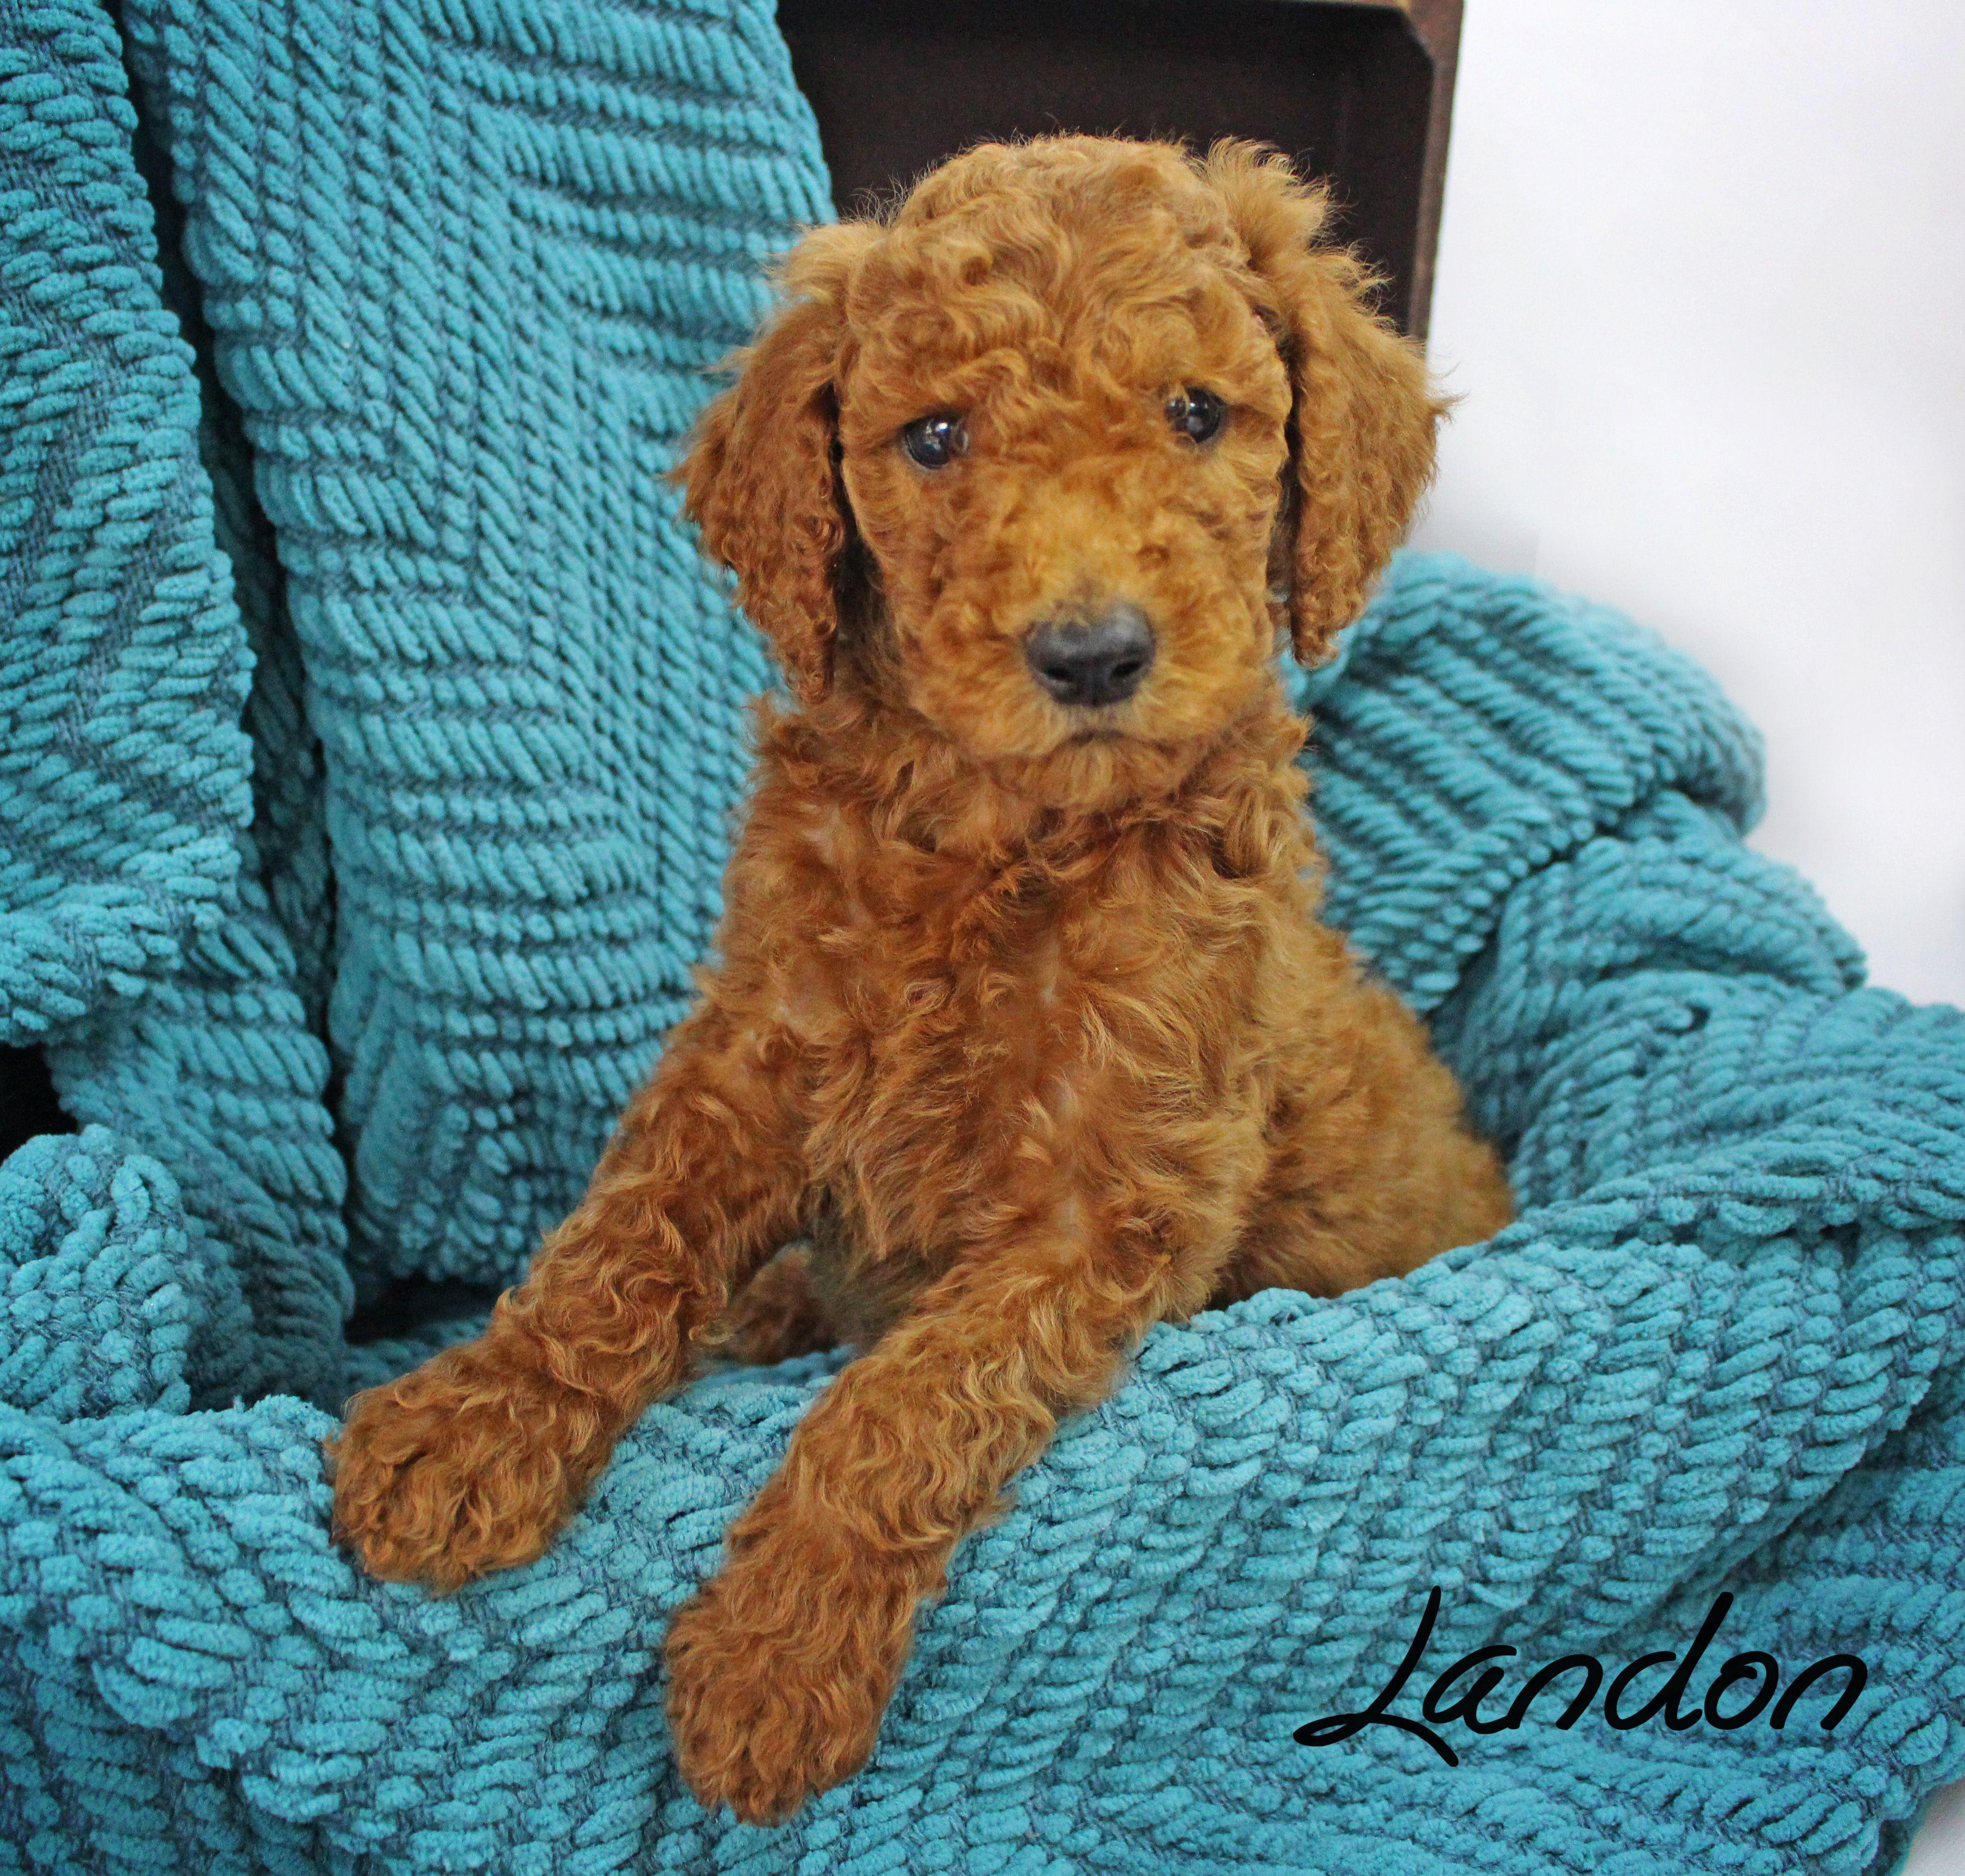 6 Week Old Standard Poodle Puppy Pet Photography Cute Sugar N